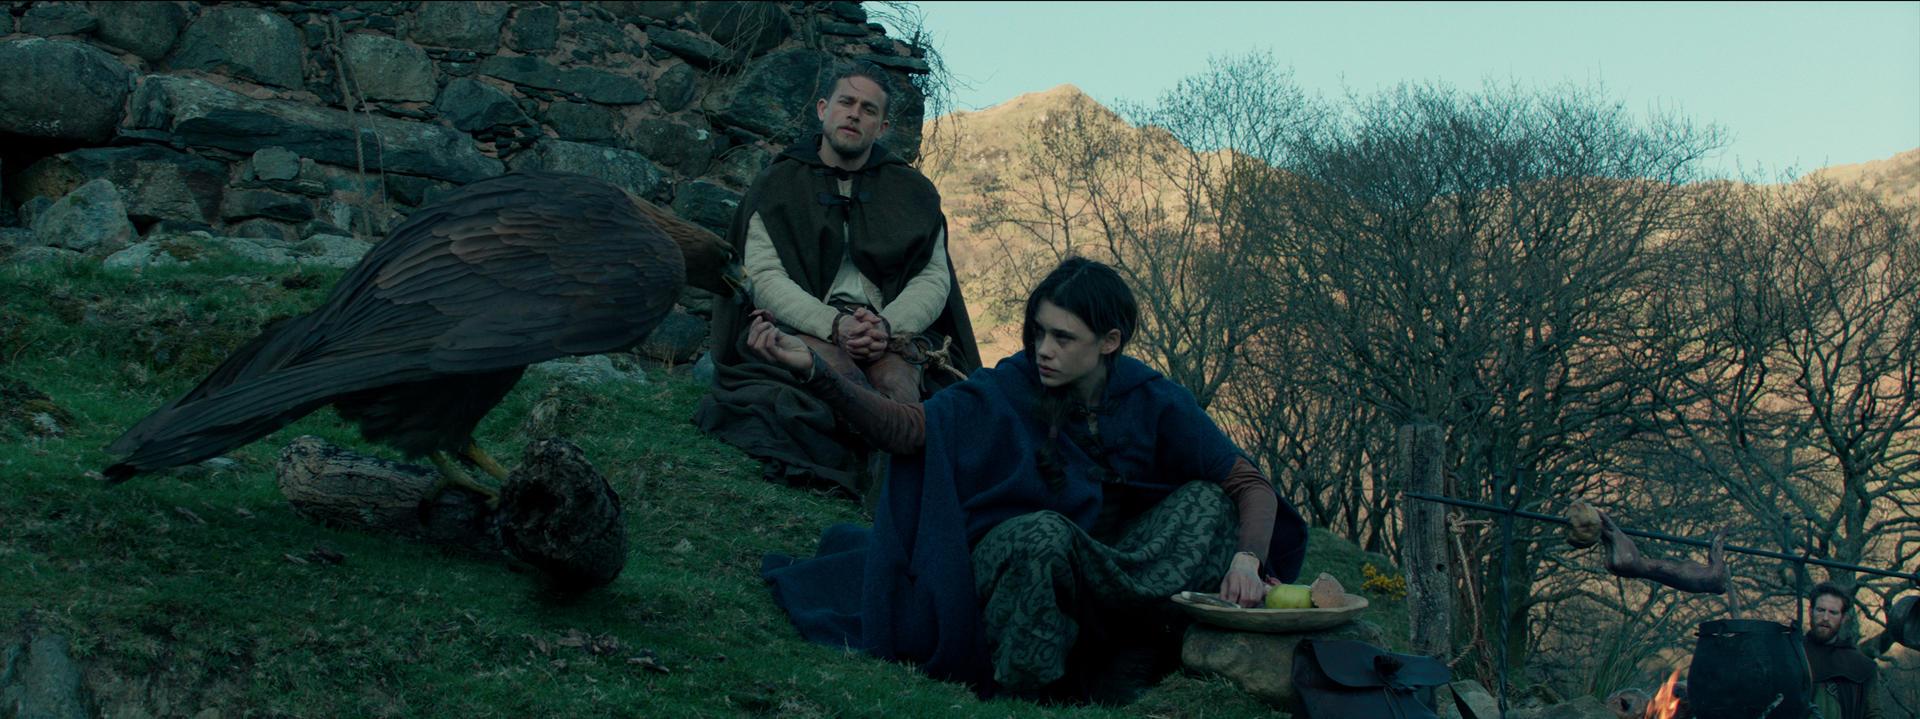 King Arthur Legend of the Sword mit Charlie Hunnam und Astrid Bergés Frisbey